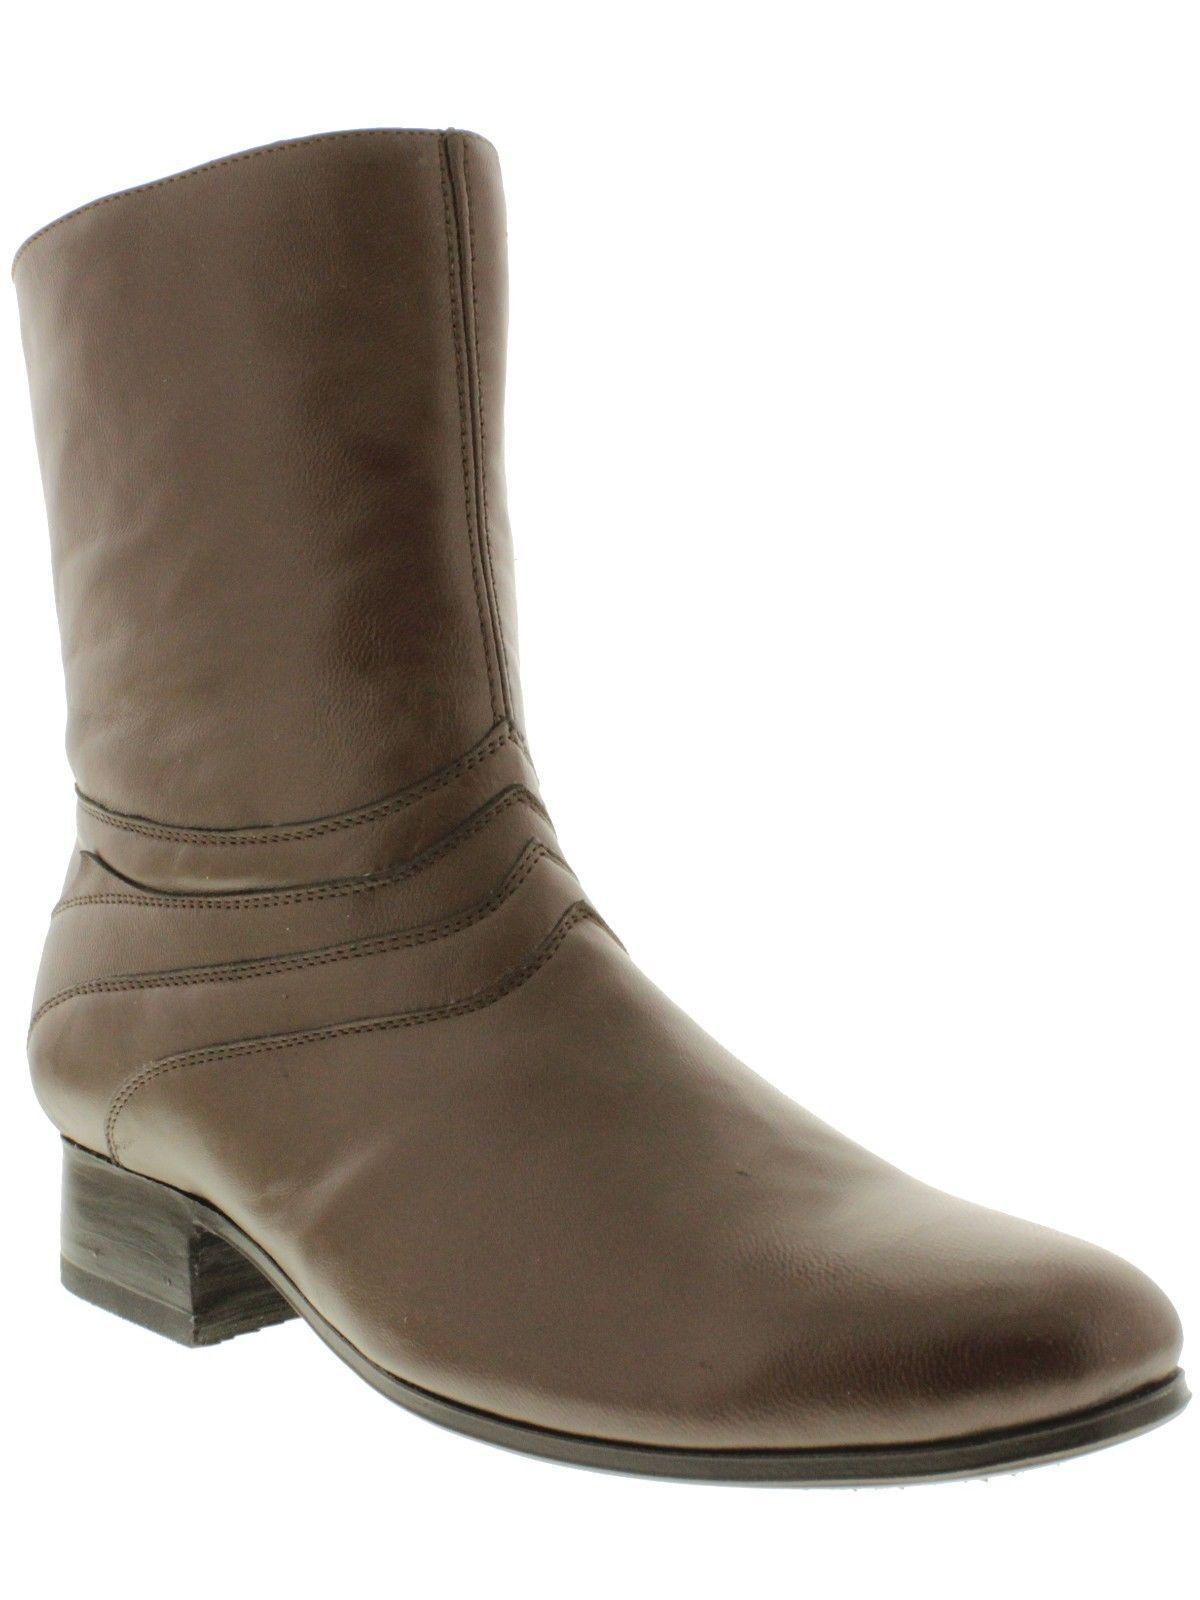 Uomo Brown Plain Pelle Dress Zipper Ankle Stivali Overlay Design Round Toe